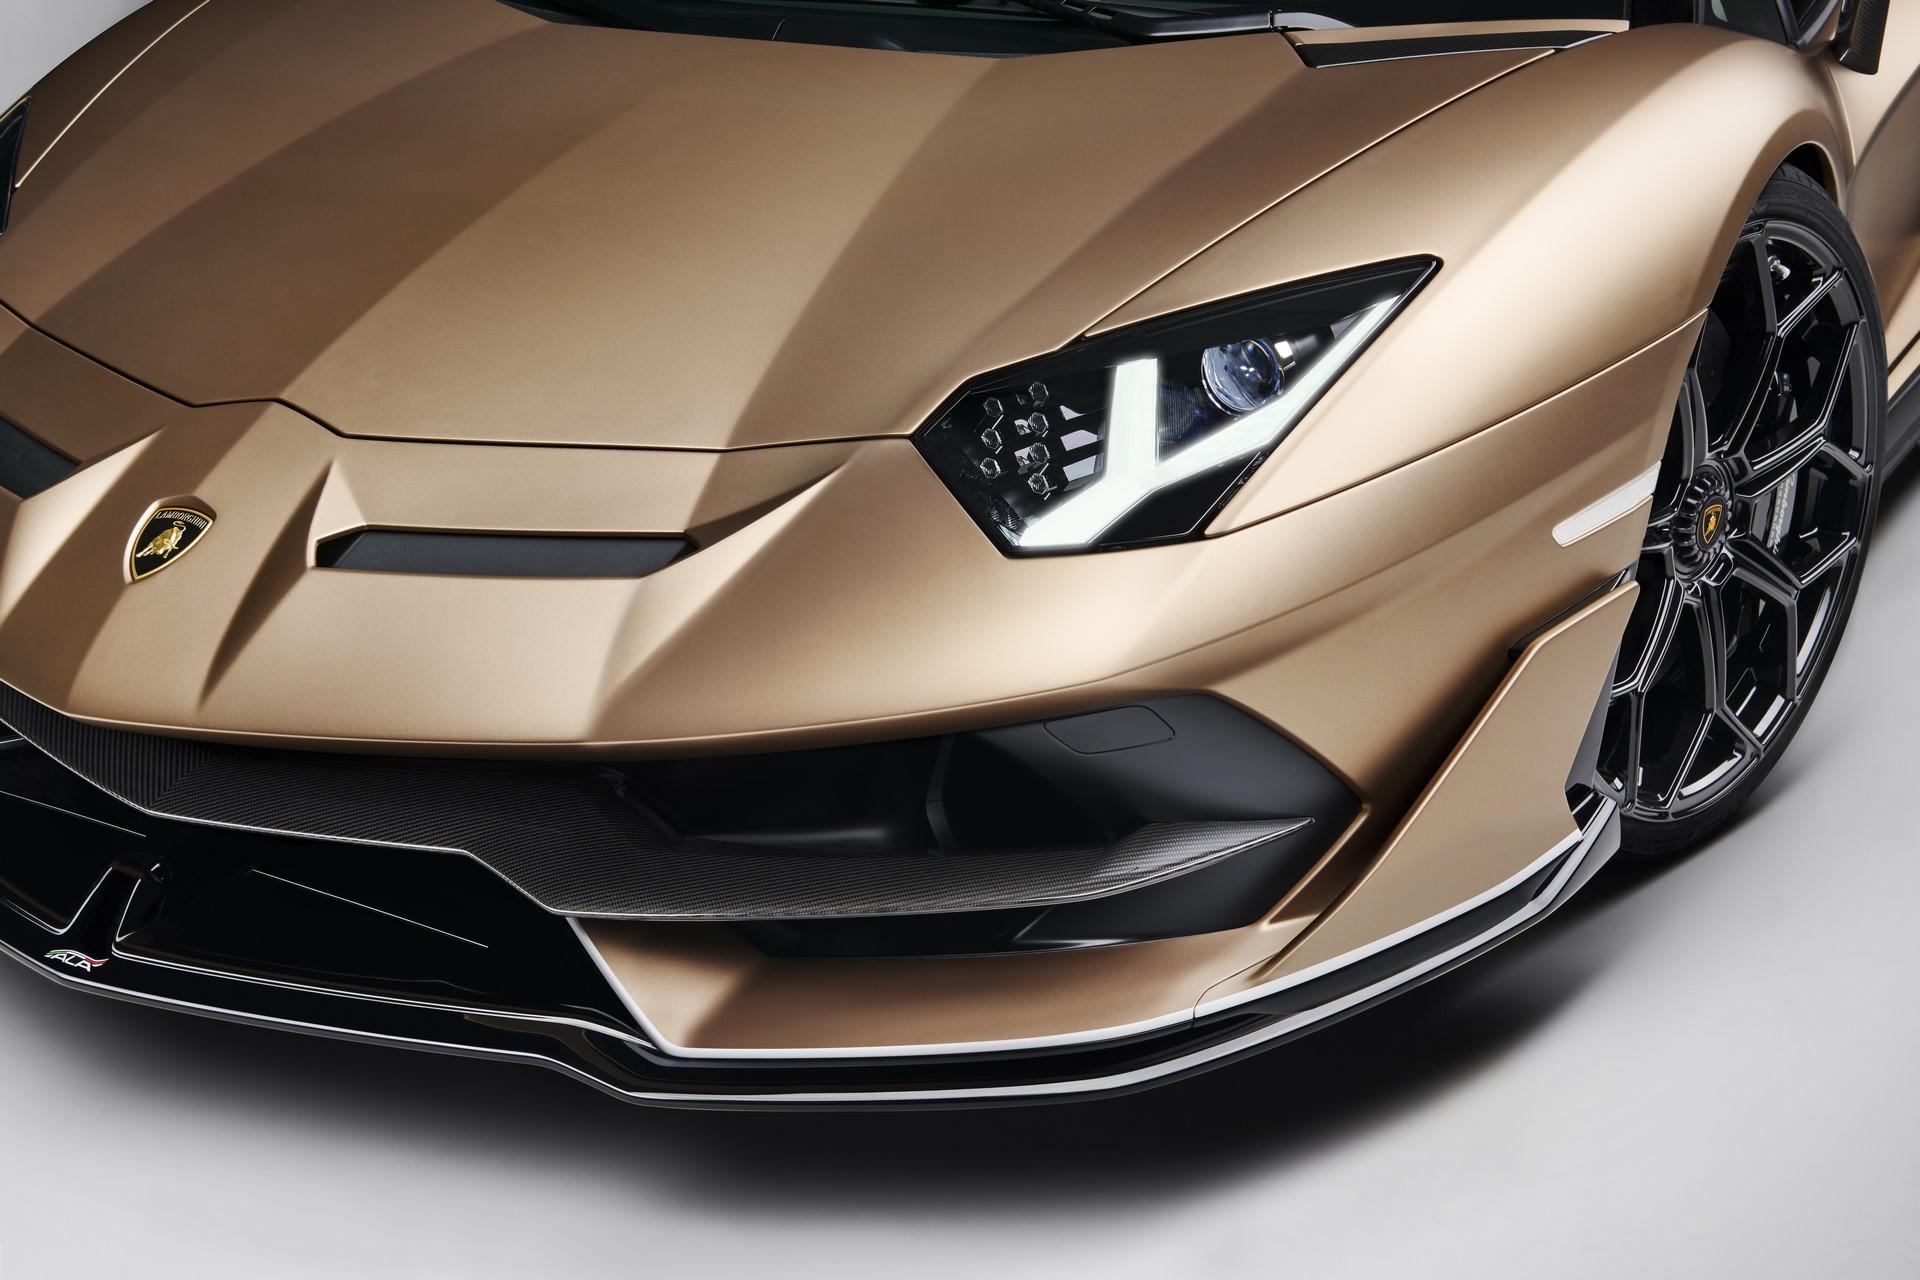 Lamborghini Aventador SVJ Roadster (33)